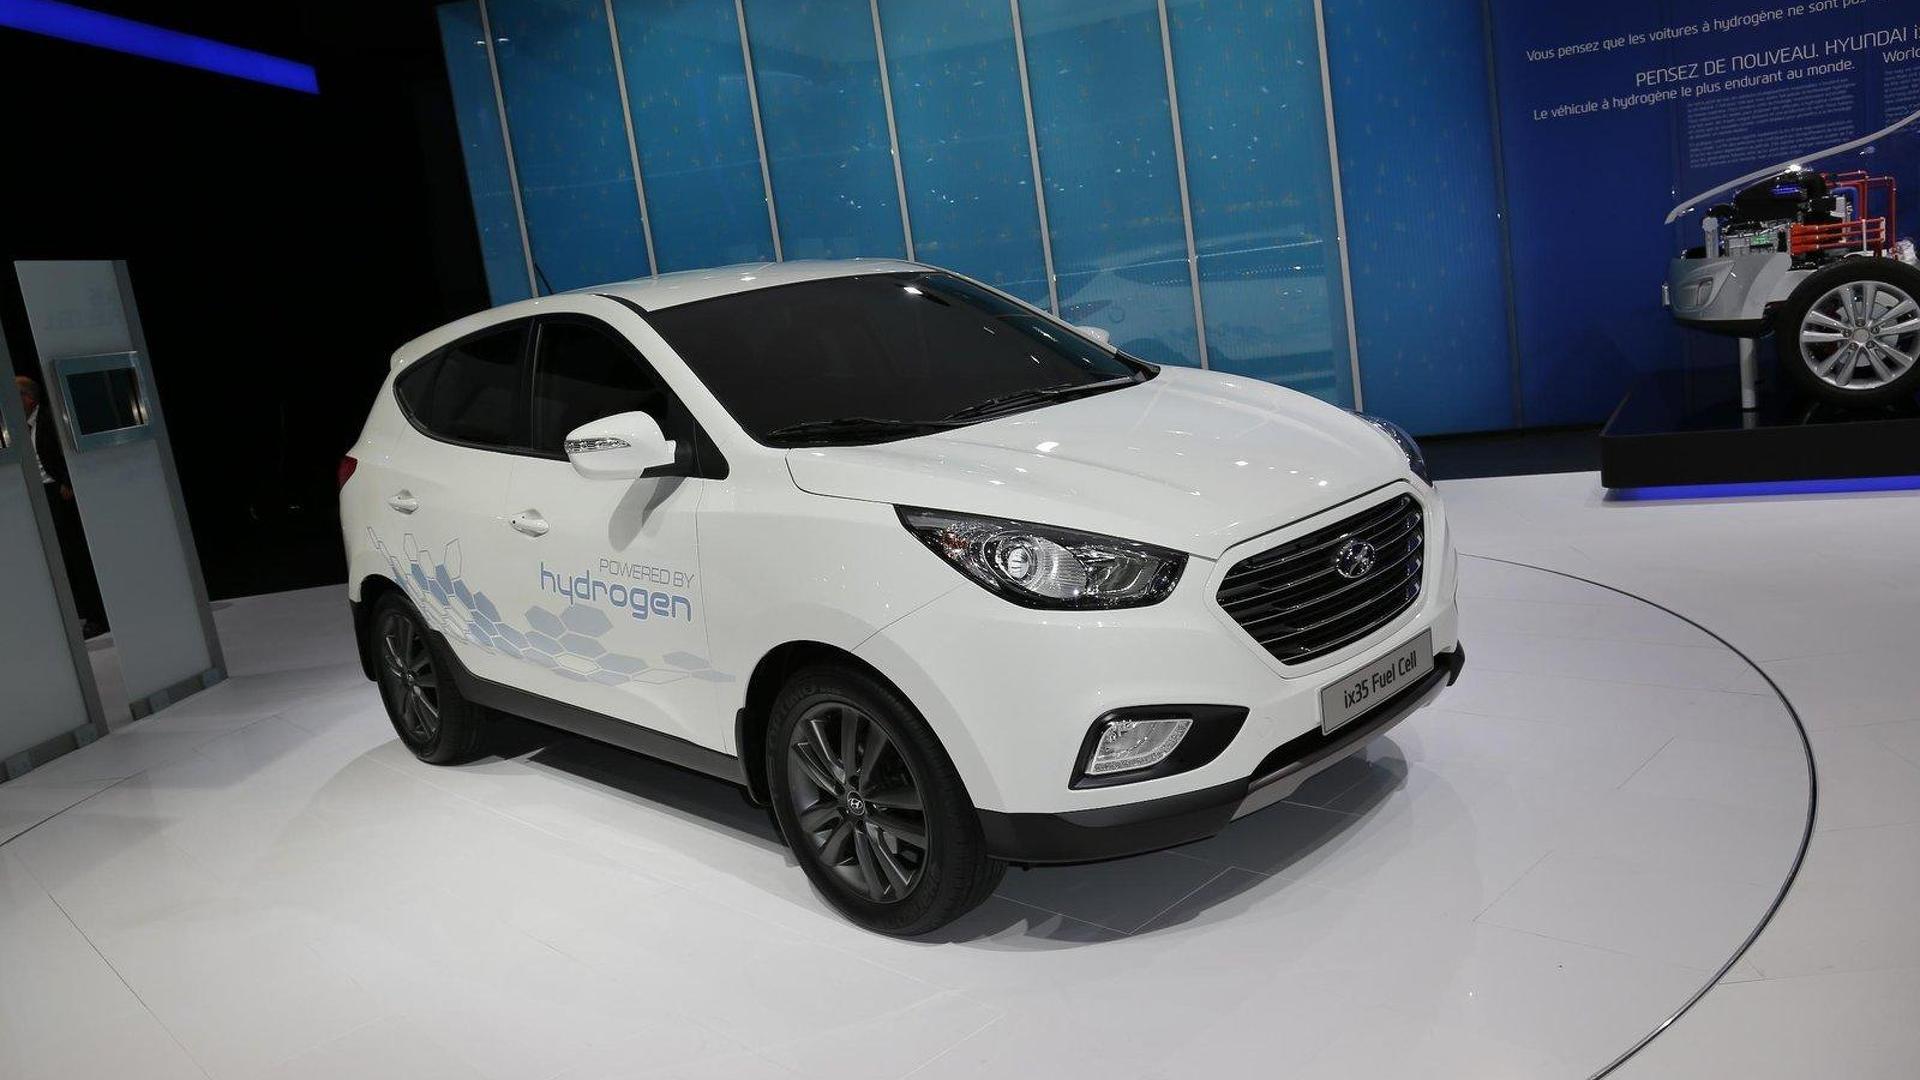 Hyundai ix35 Fuel Cell will go into production